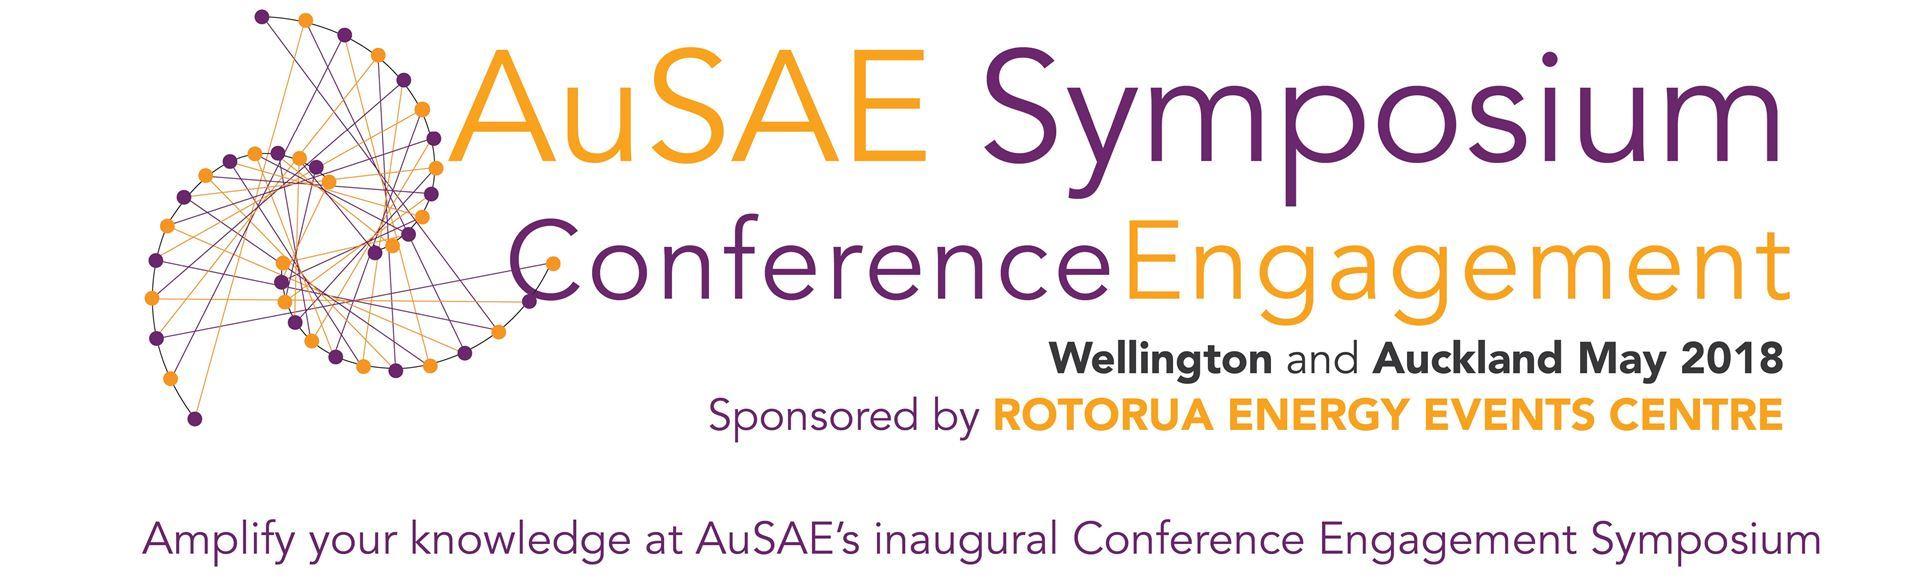 AuSAE Symposium - Conference Engagement v1.jpg